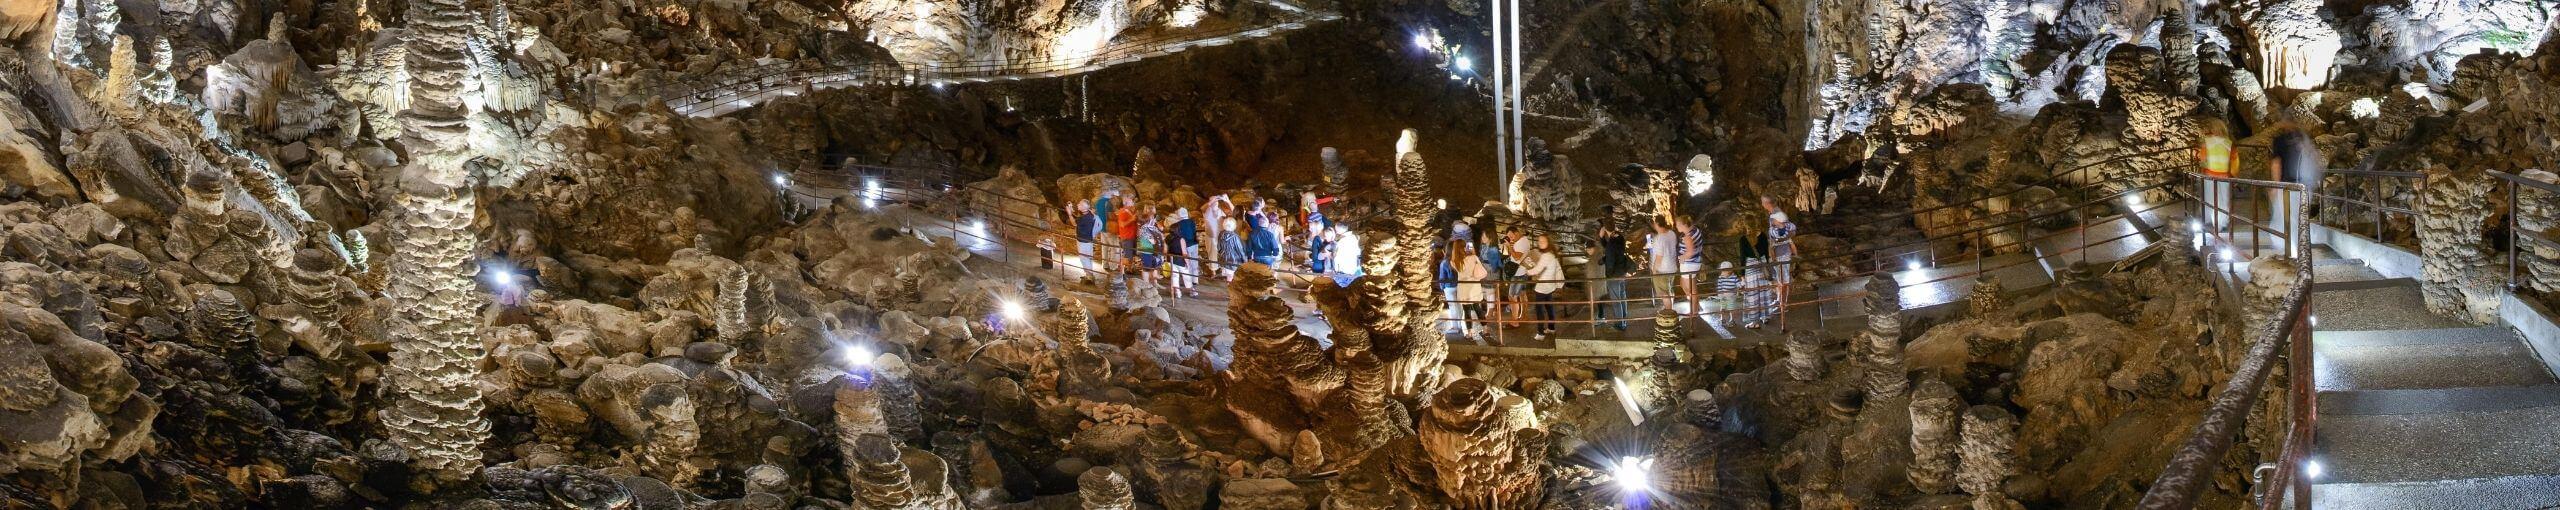 Grotta Gigante. Trieste, Friuli-Venecia Julia. Italia.